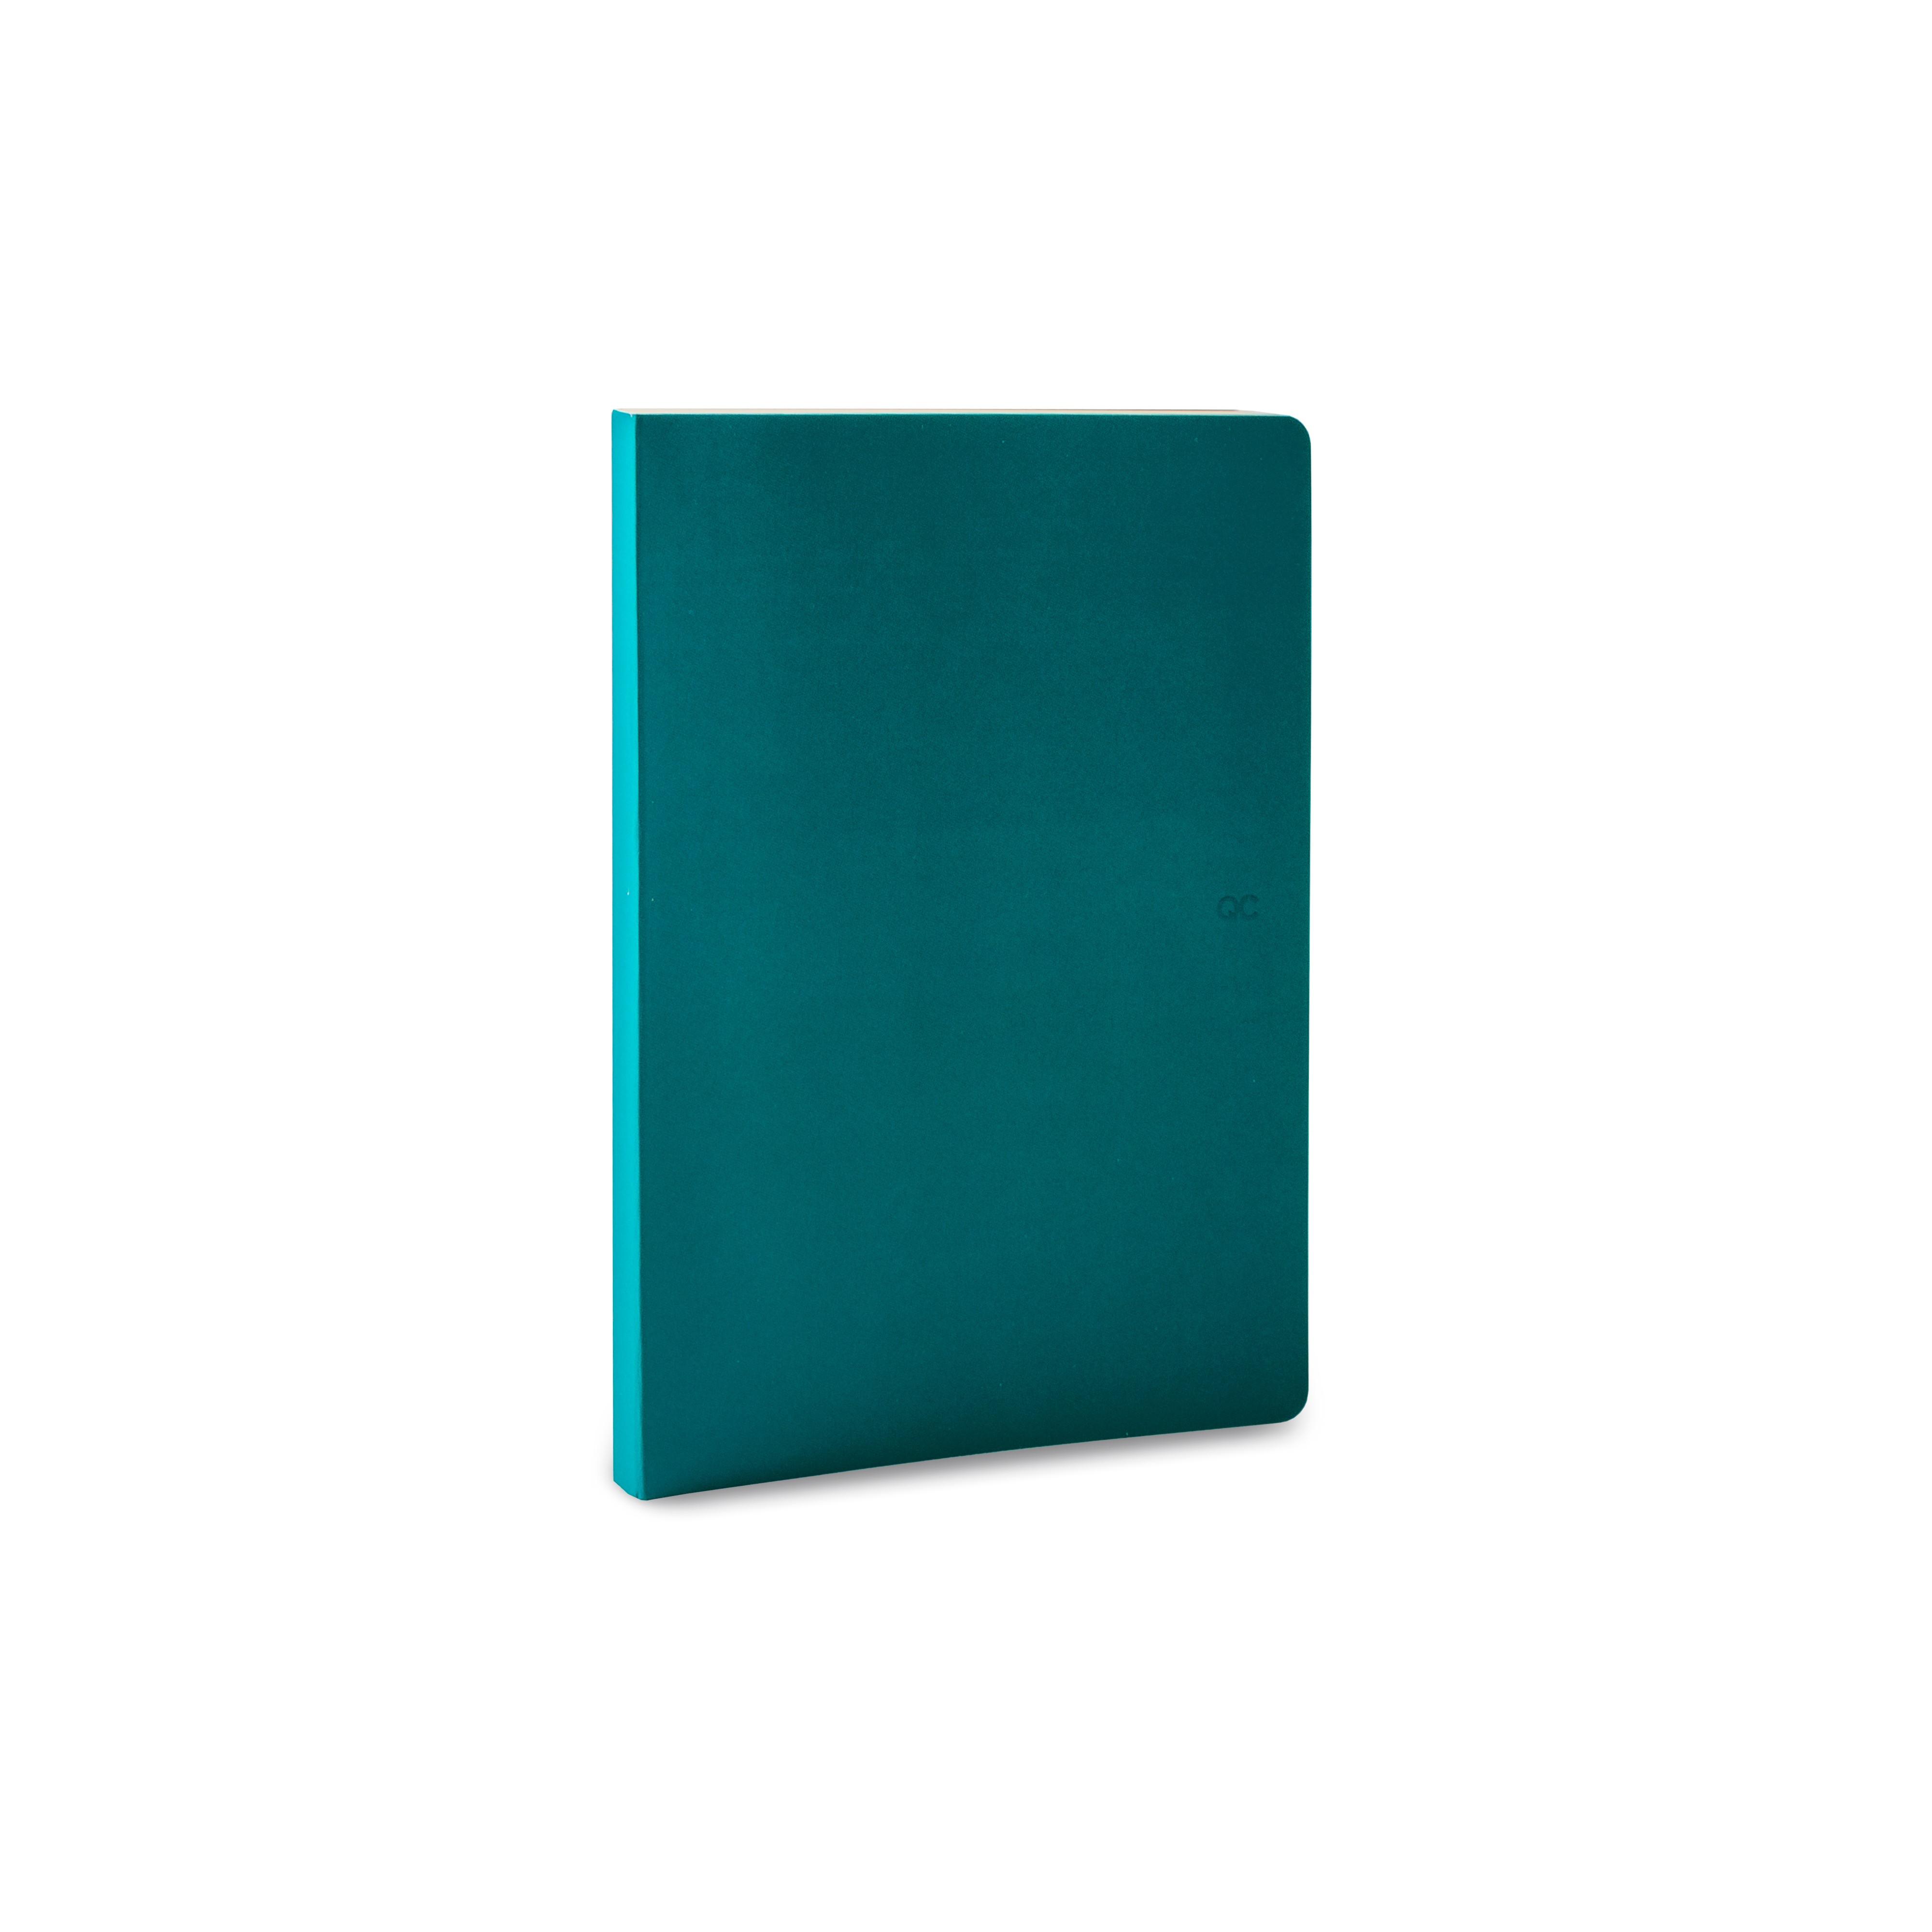 Notizbuch A5 | 88 Blätter | Blau